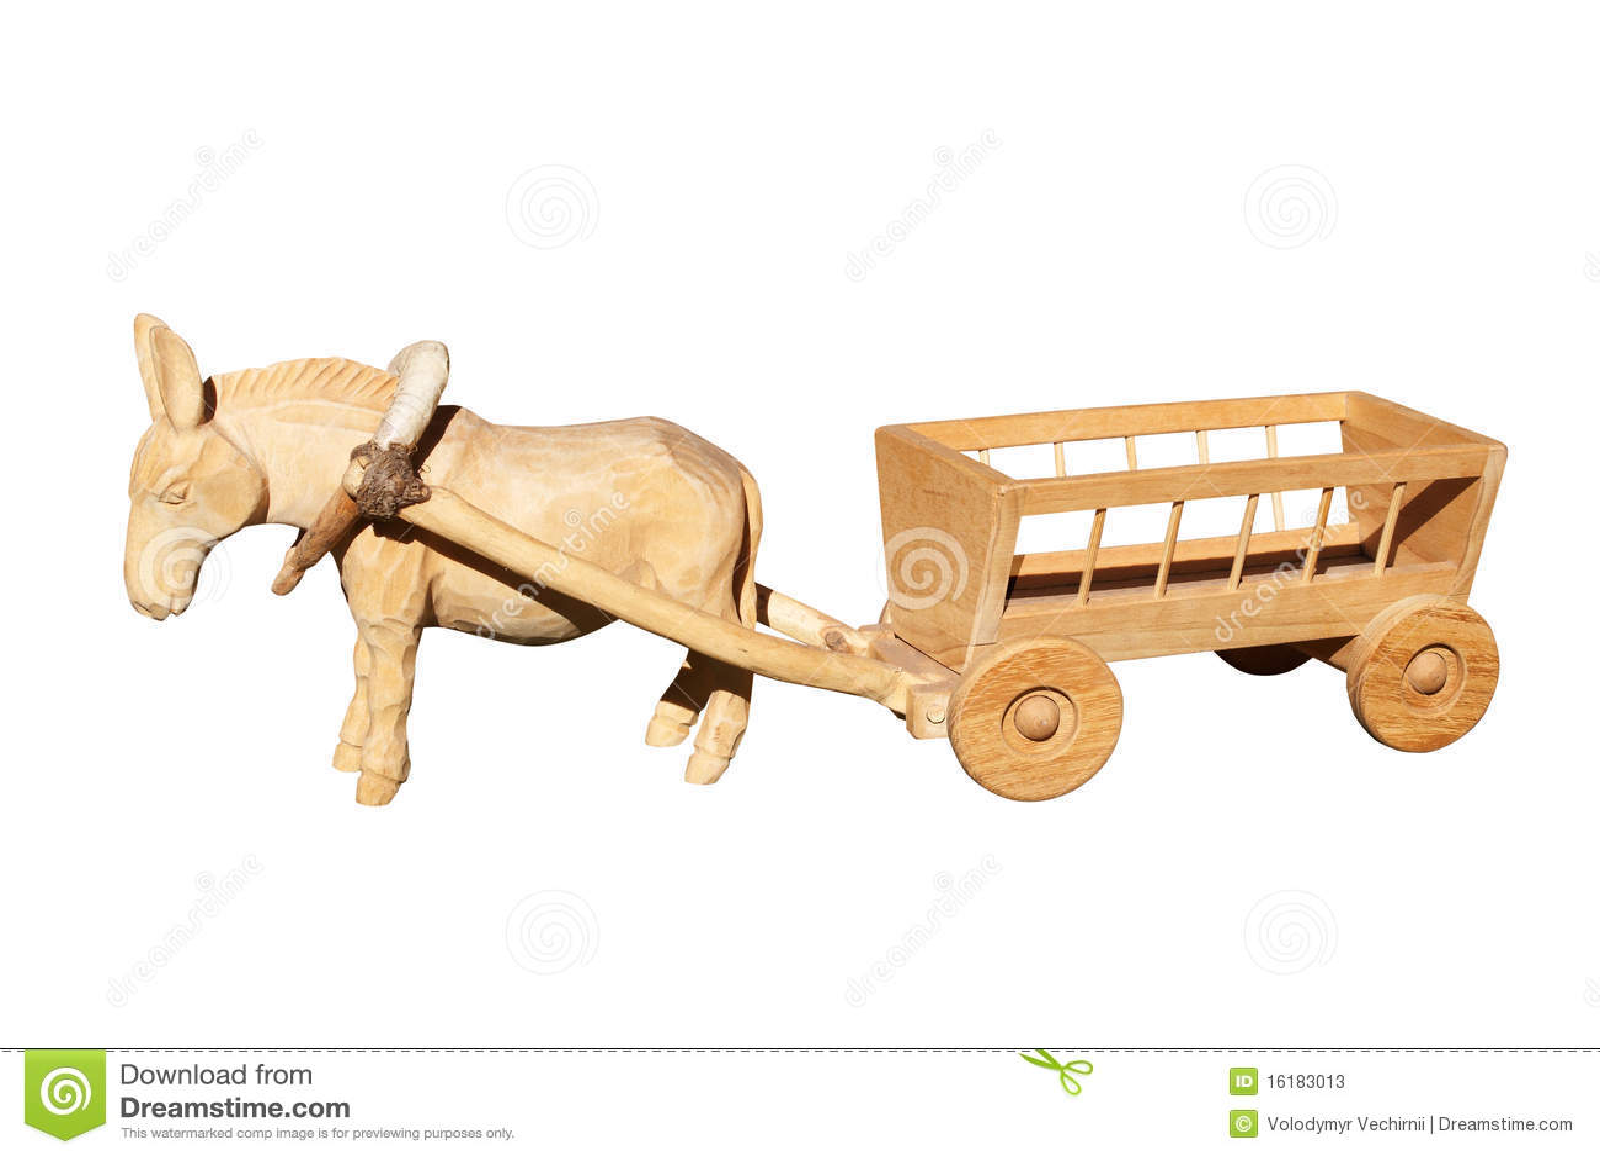 Juguetes de madera viejos